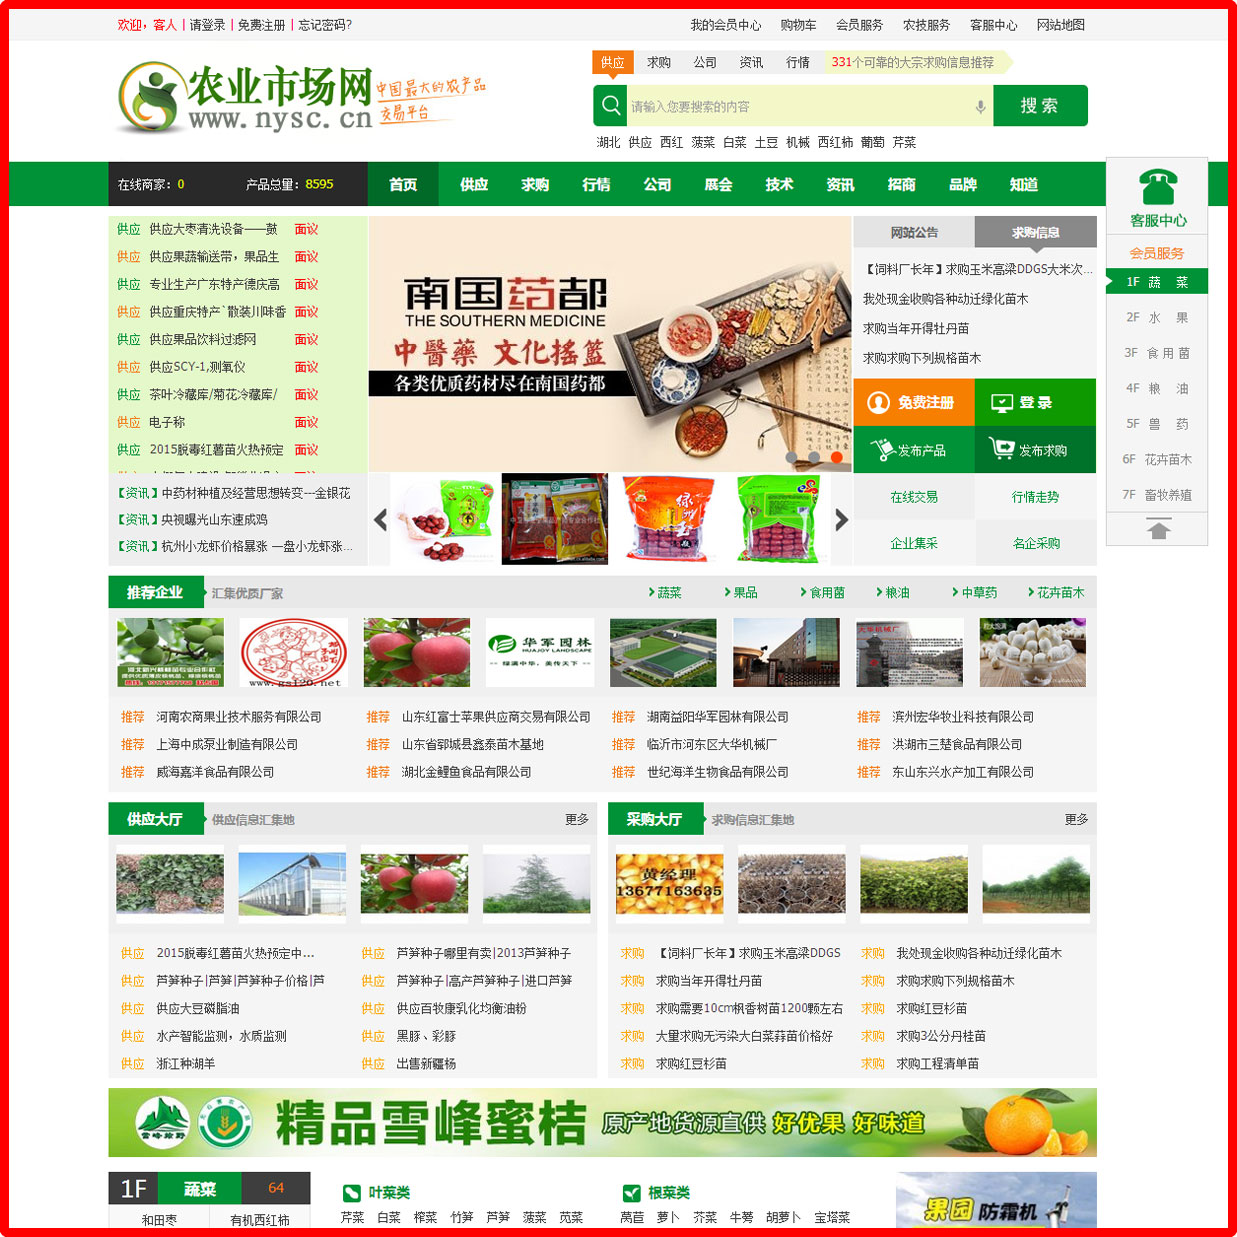 destoon6.0模板 绿色仿惠农网农业网站源码